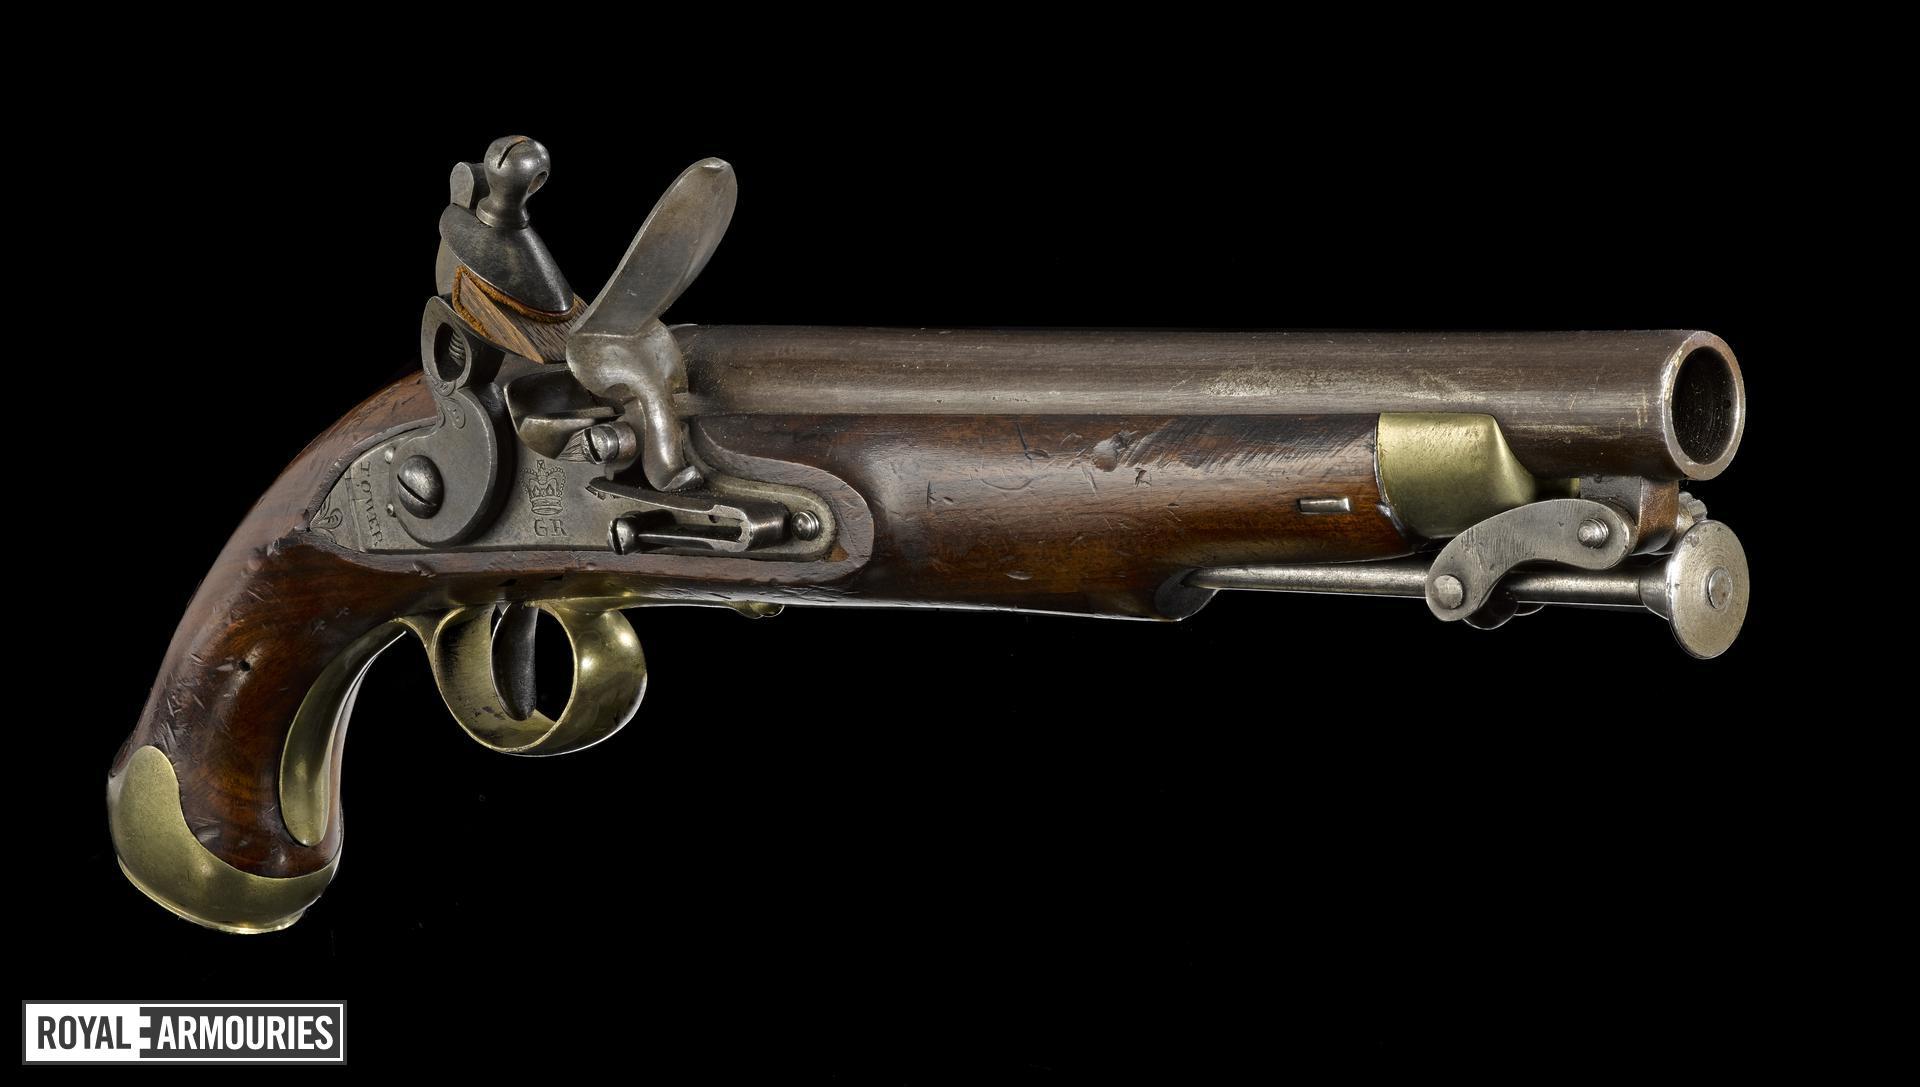 Flintlock muzzle-loading pistol - Paget Light Cavalry Model